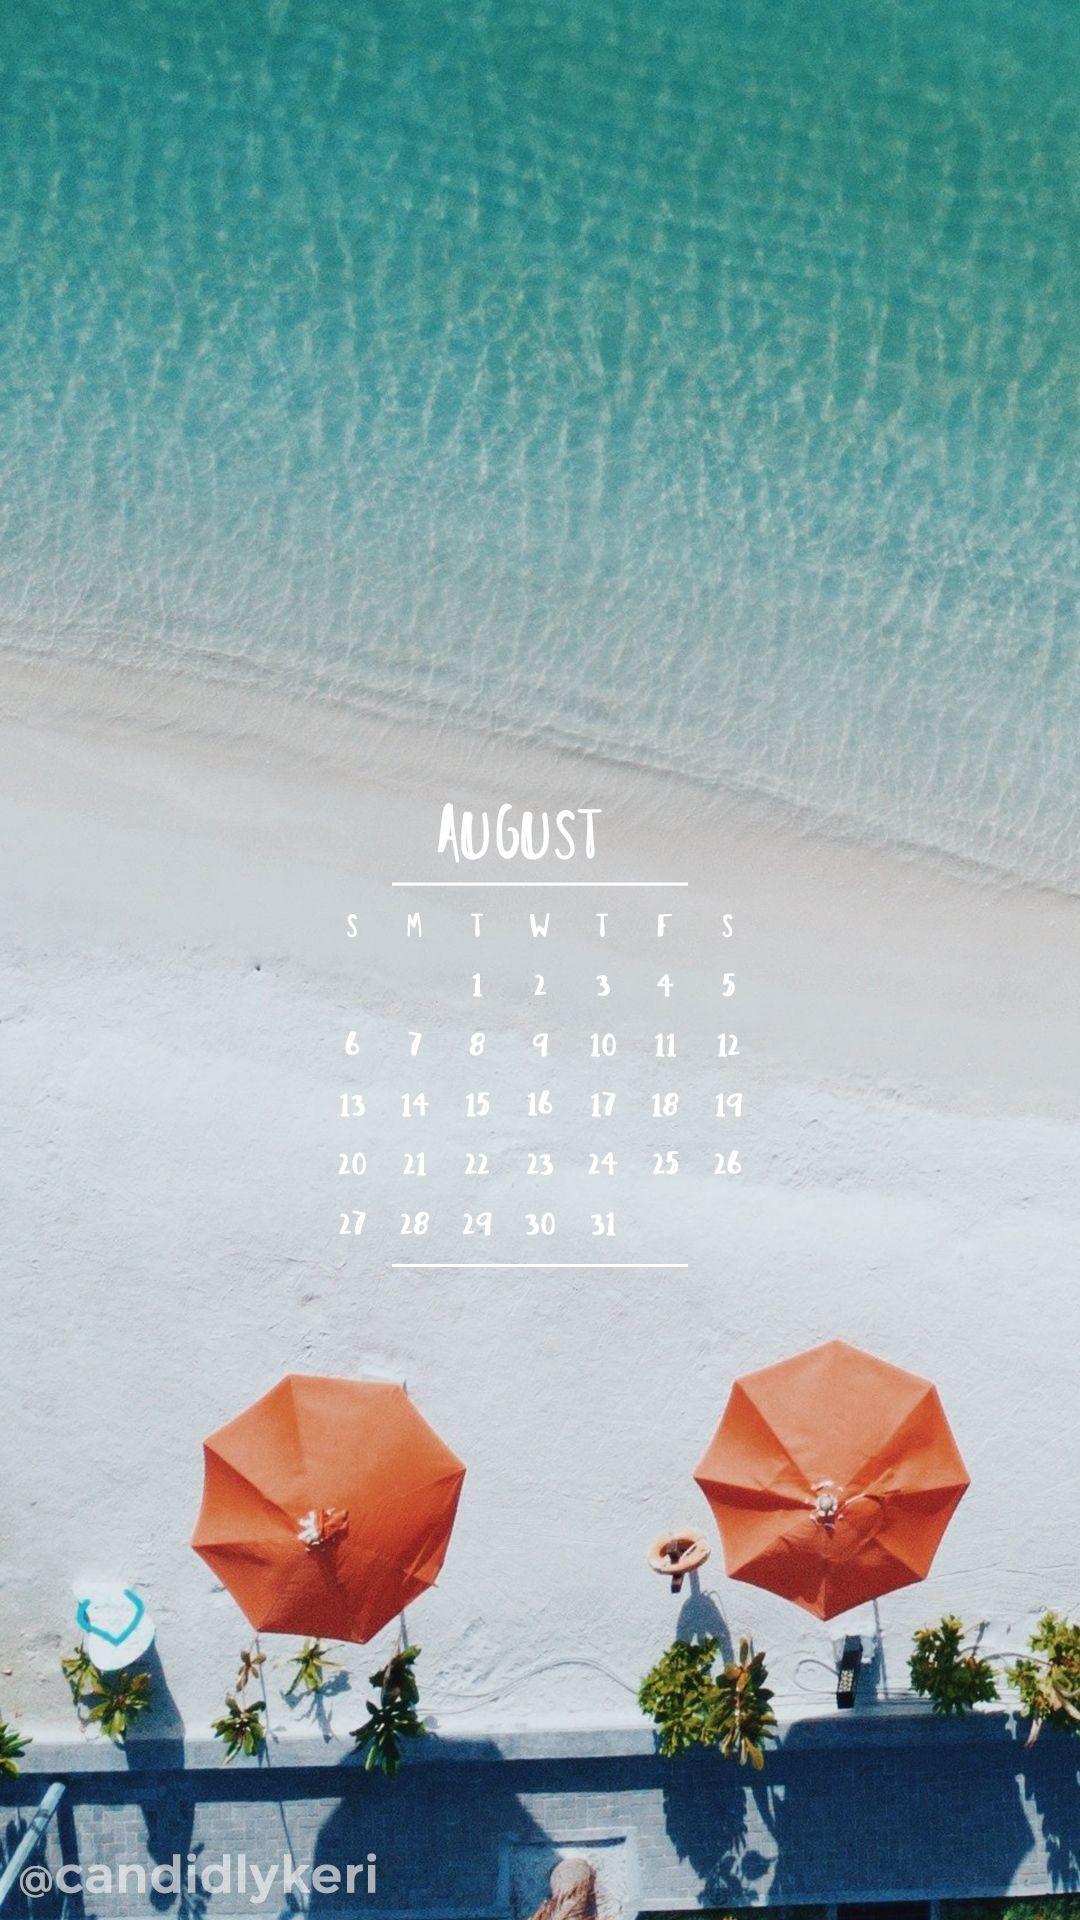 Beach Fun Oragne Umbrella August Calendar 2017 Wallpaper You Can Download  On The Blog! For